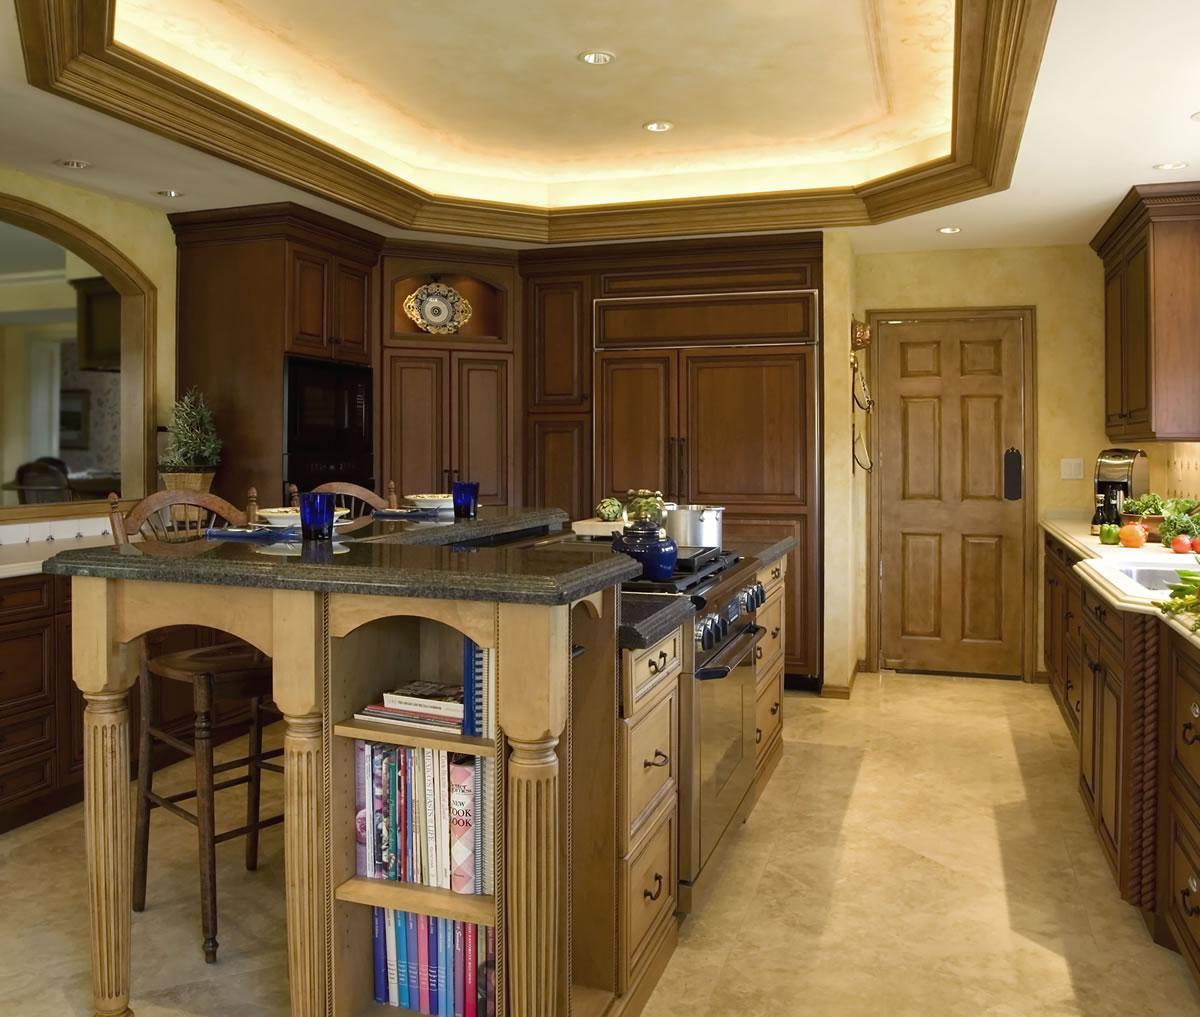 Cowan Heights Kitchen Remodeling | Le Gourmet Kitchen Ltd.